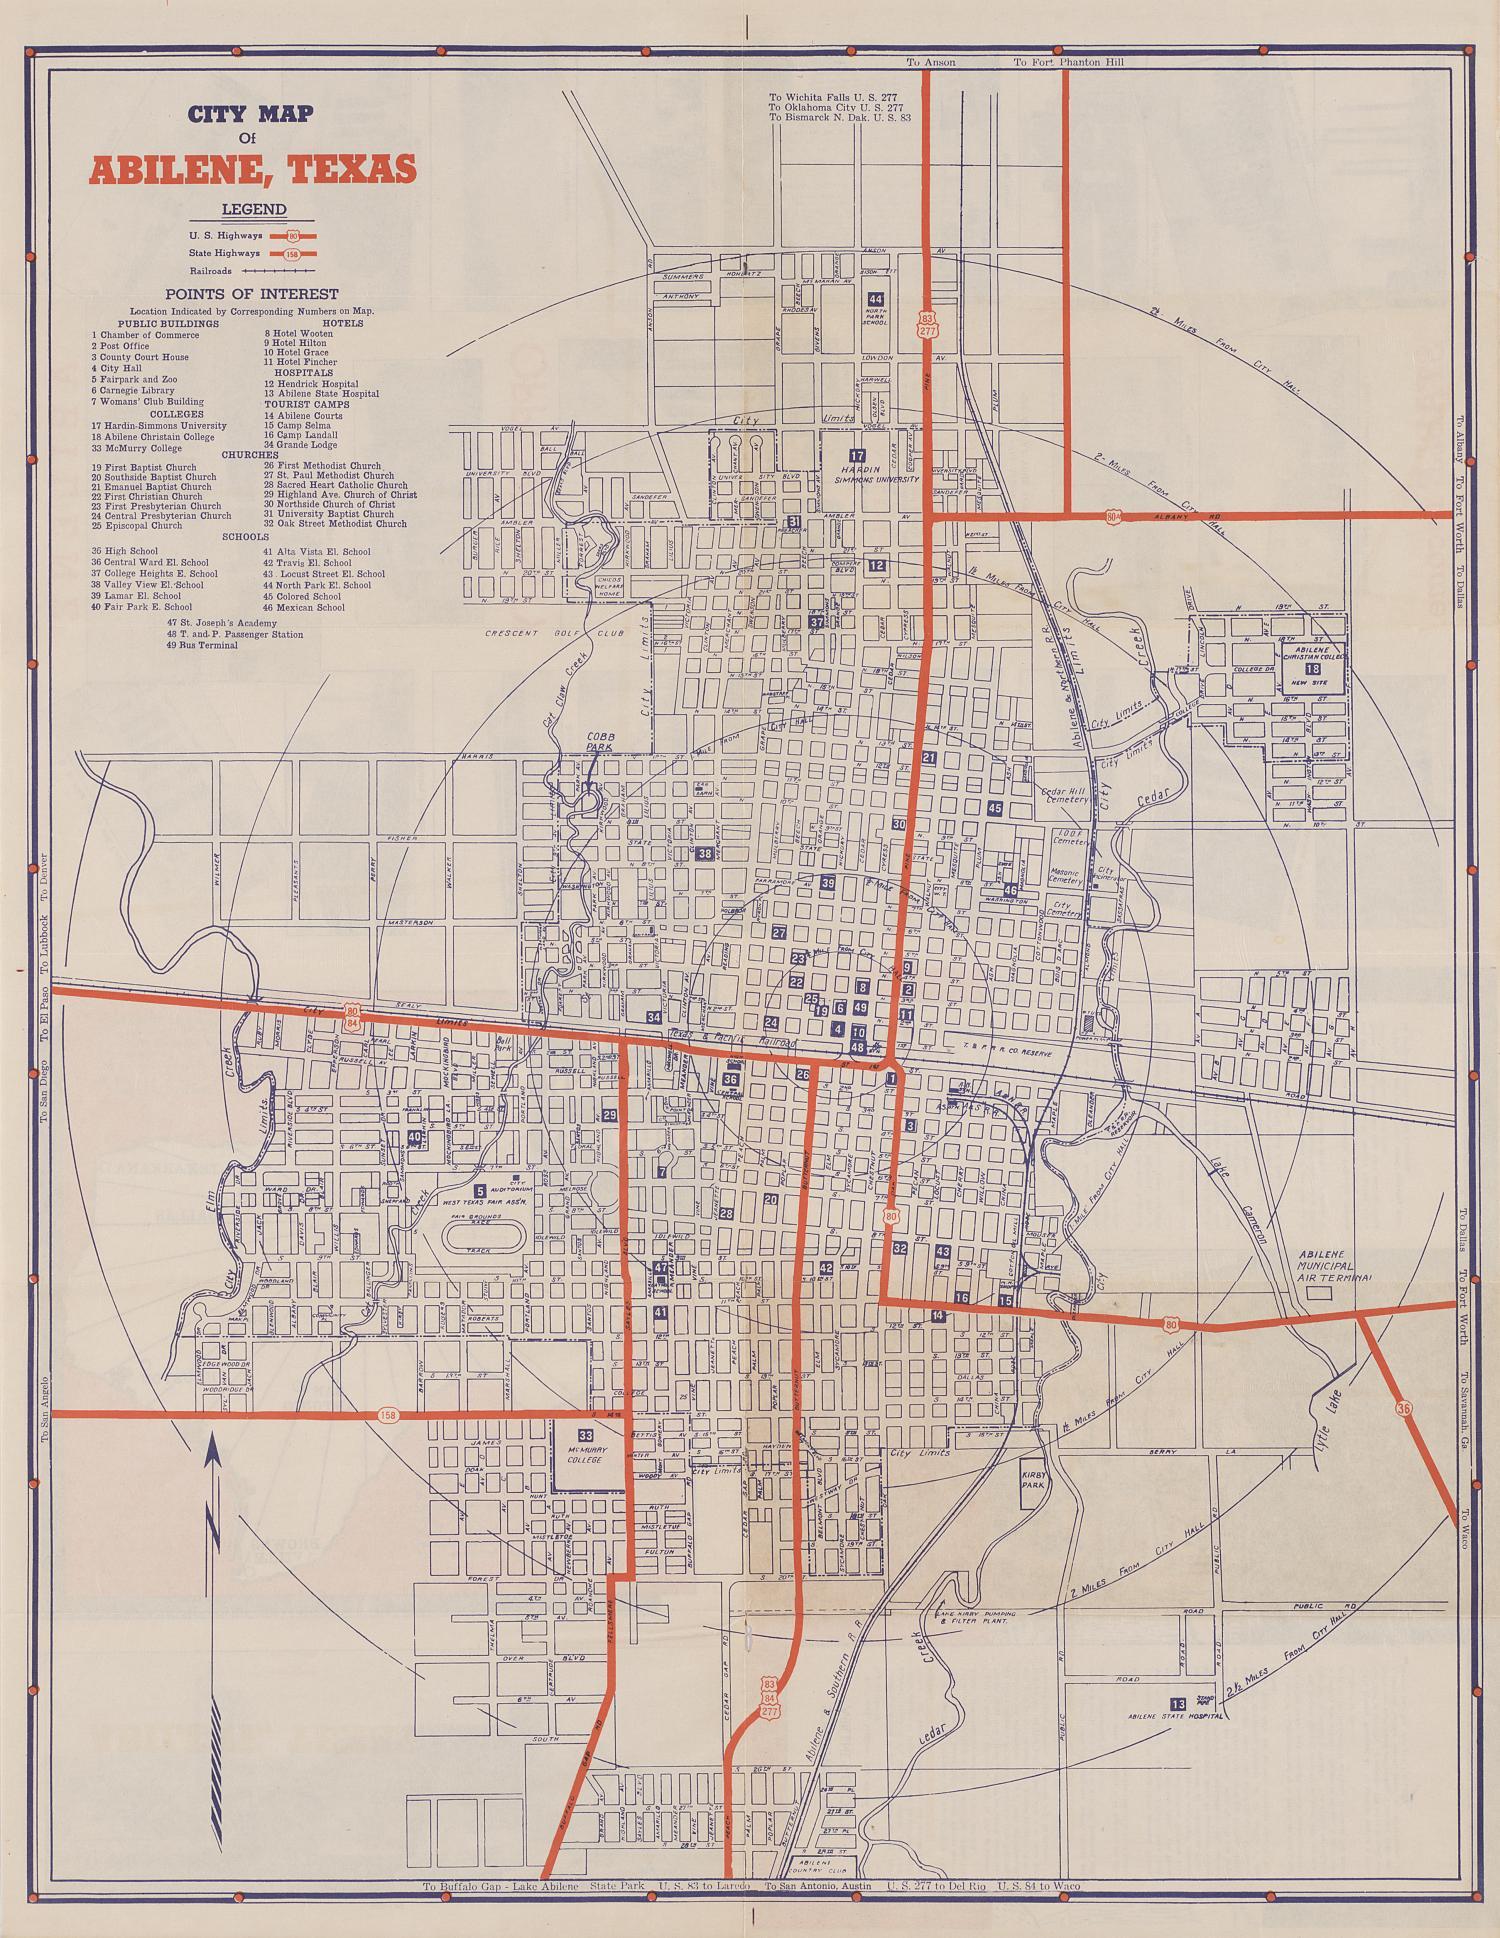 Map Of Abilene Texas City Map of Abilene, Texas   The Portal to Texas History